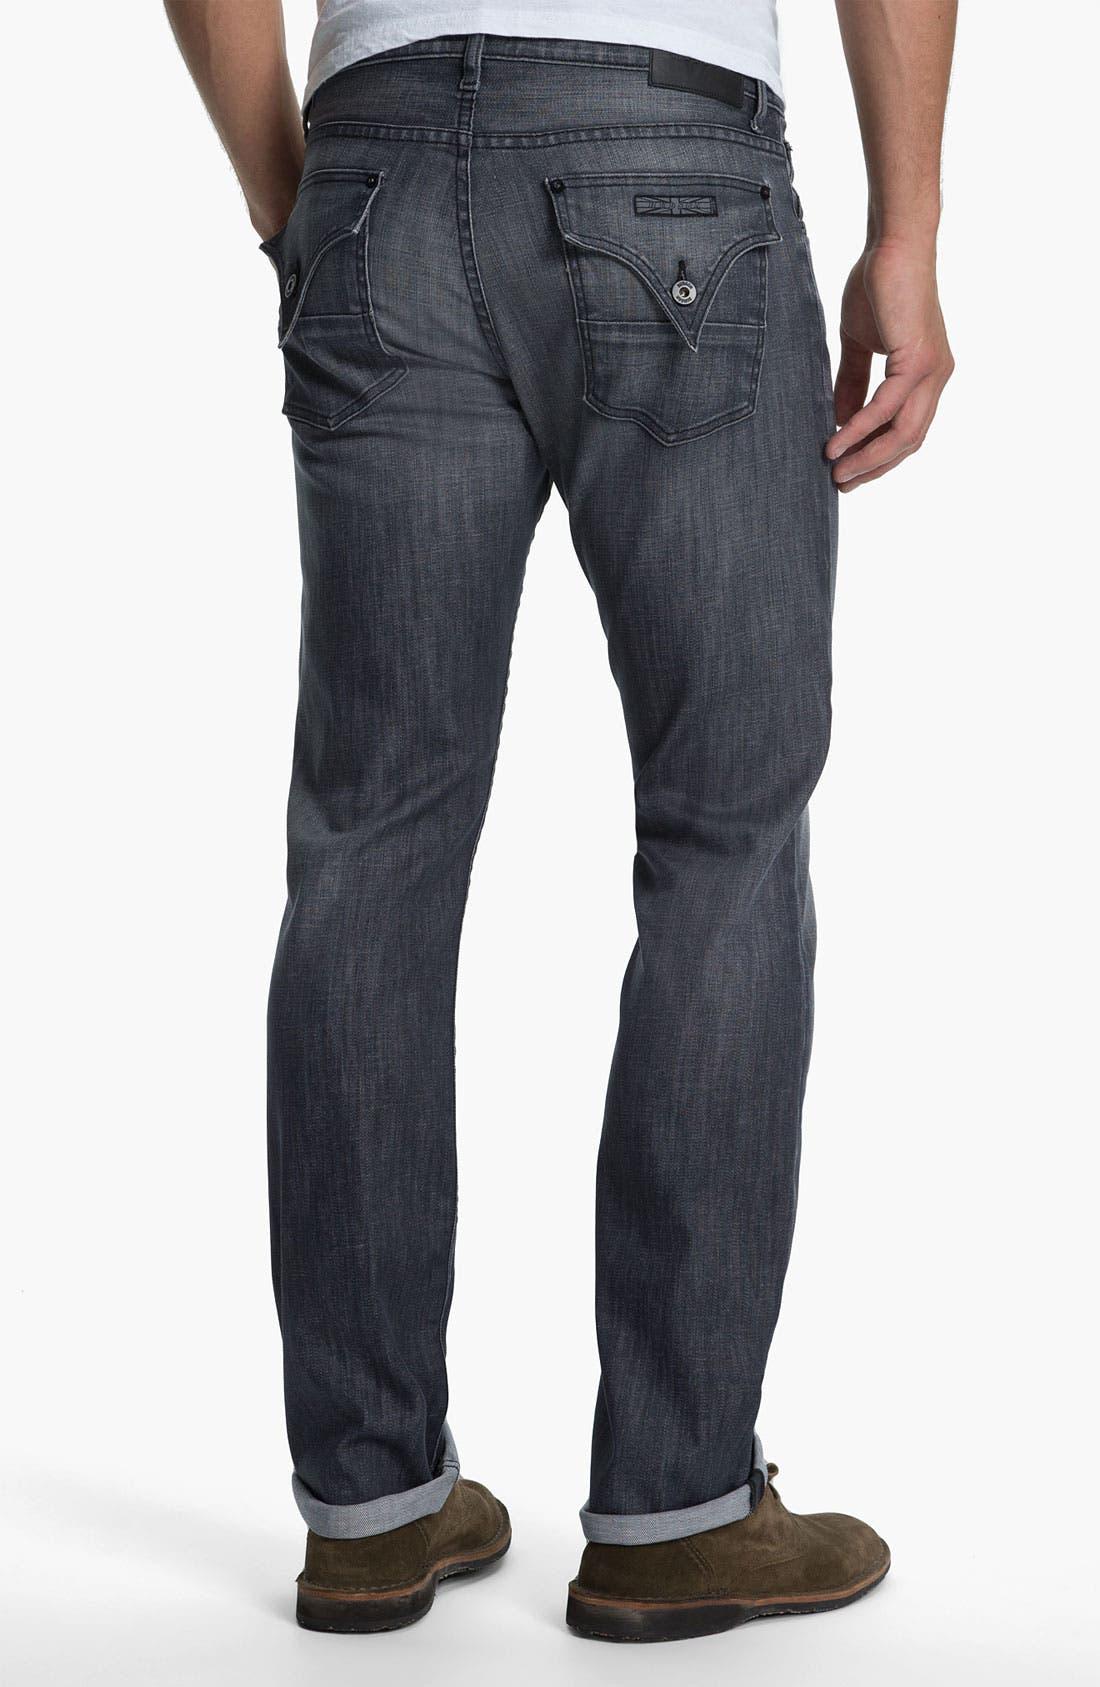 Alternate Image 1 Selected - Hudson Jeans 'Byron' Straight Leg Jeans (Virage)